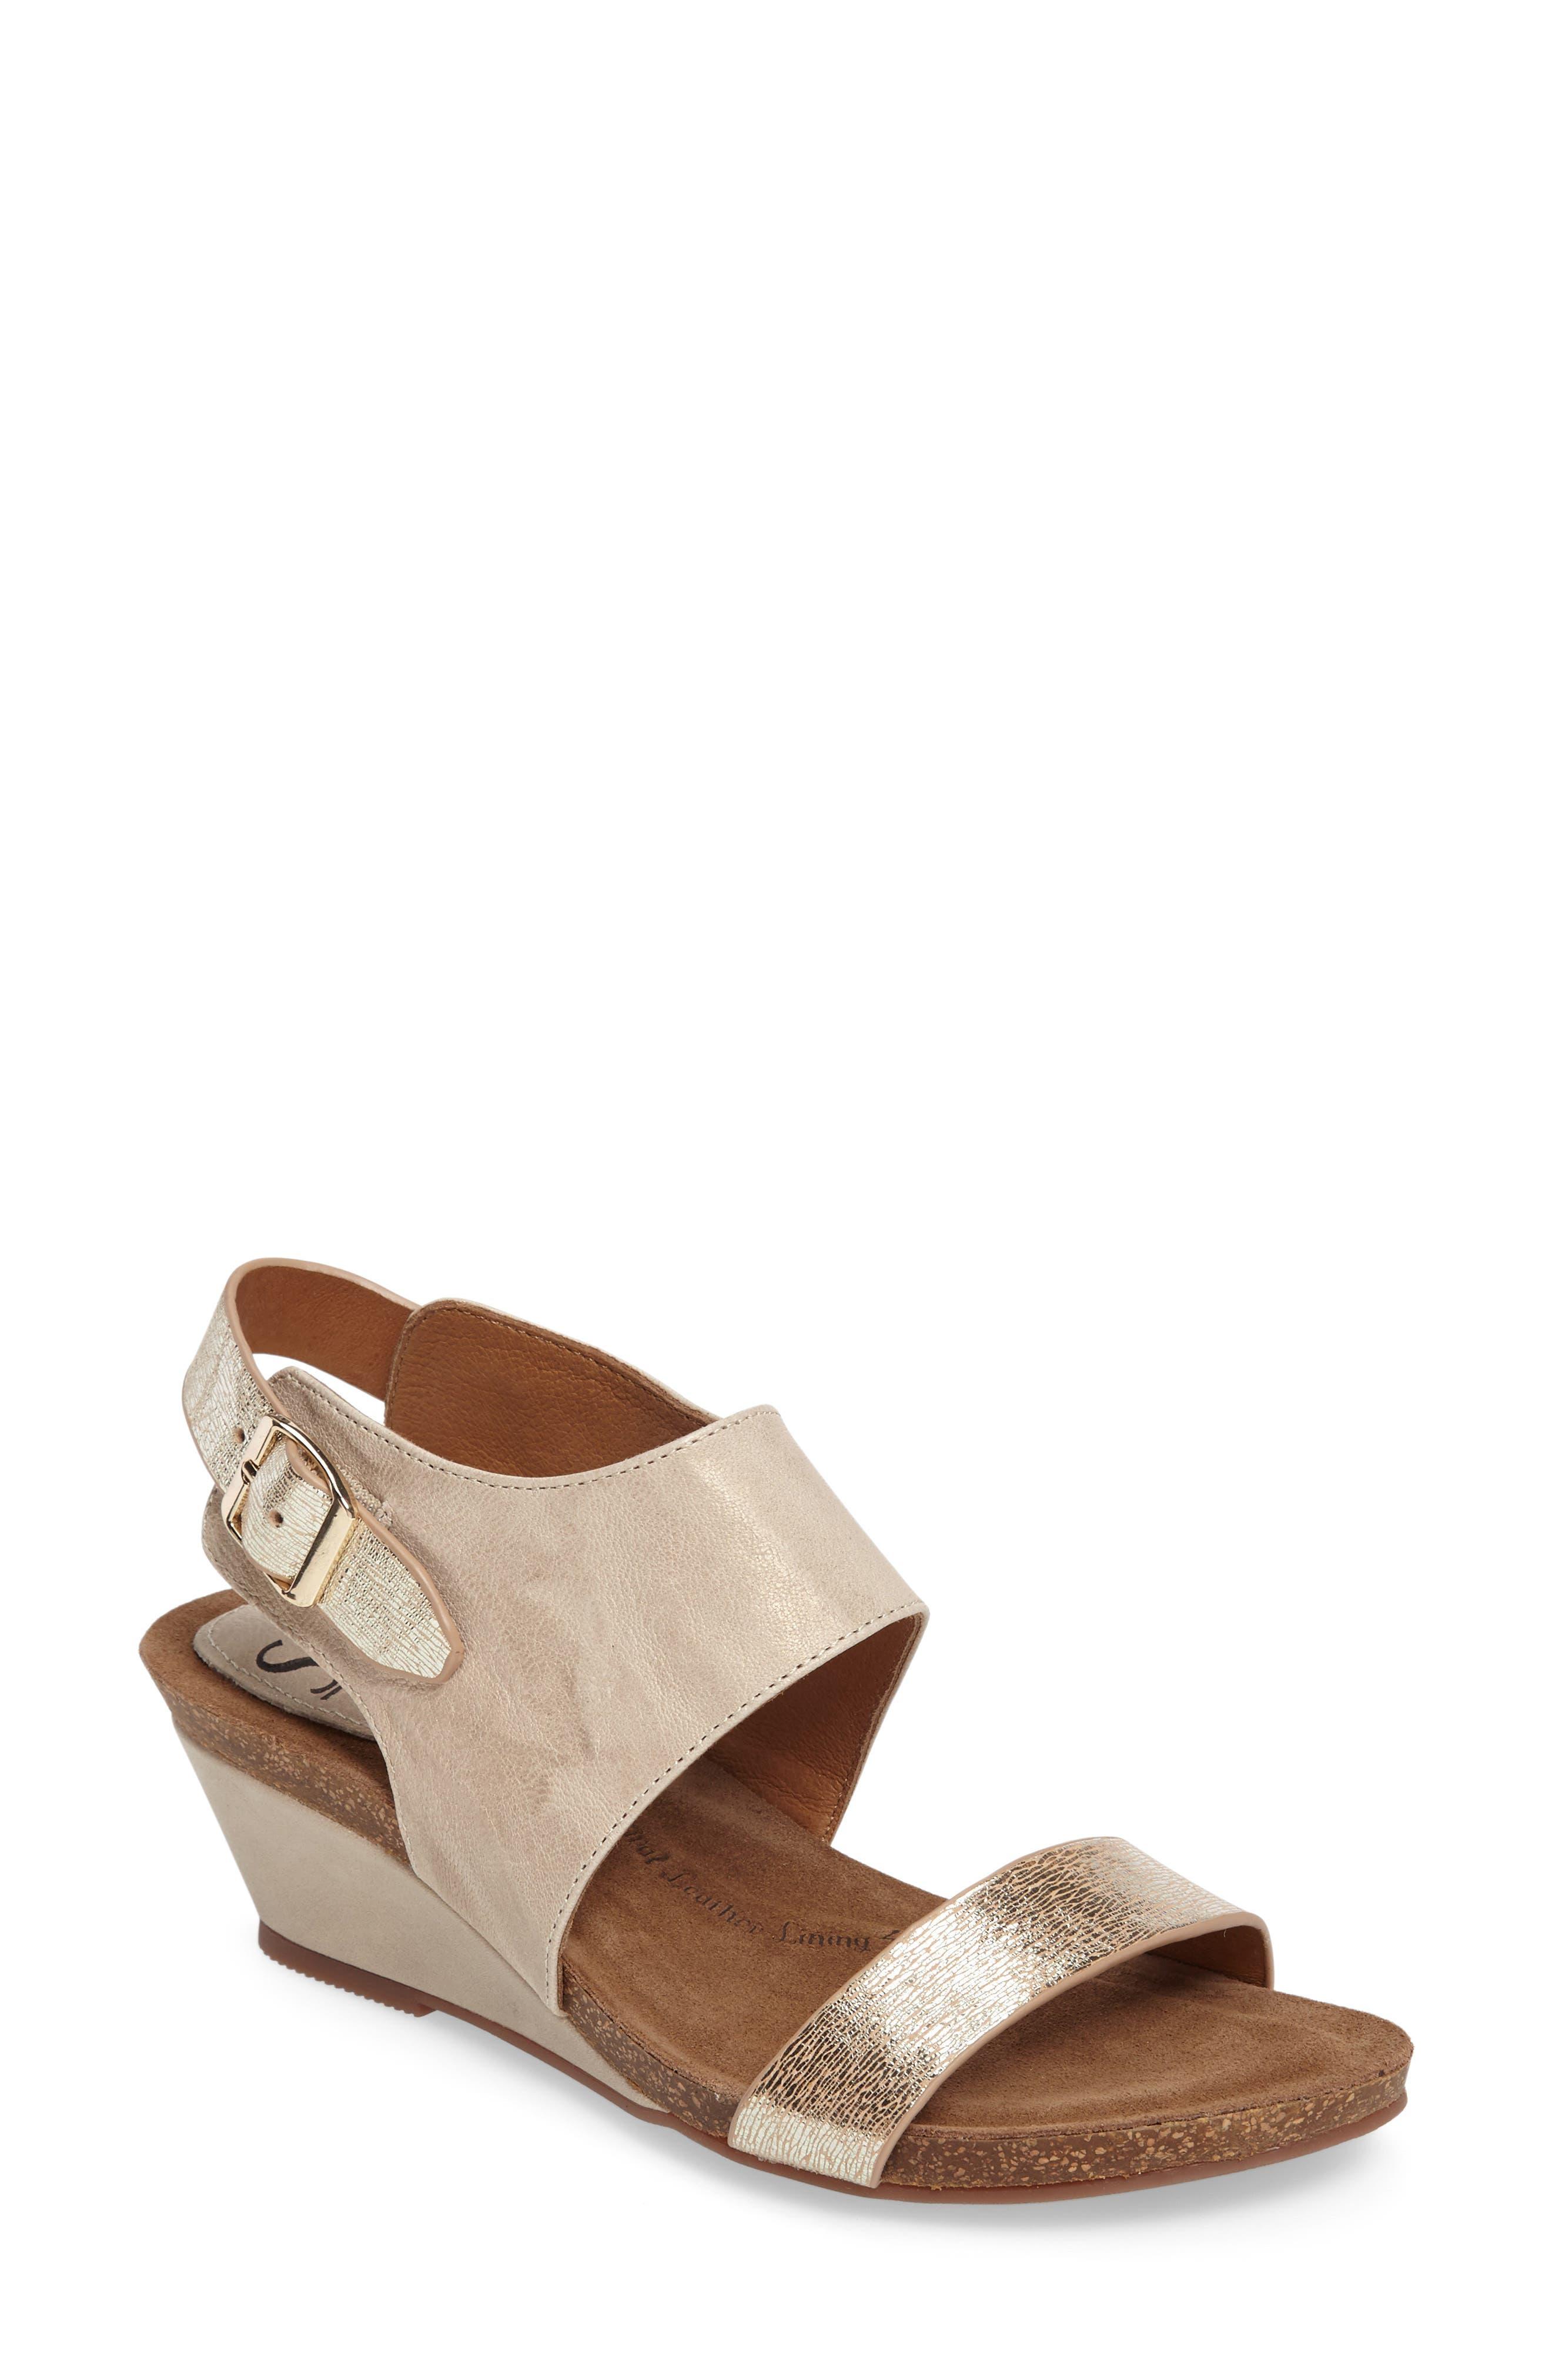 SÖFFT 'Vanita' Leather Sandal